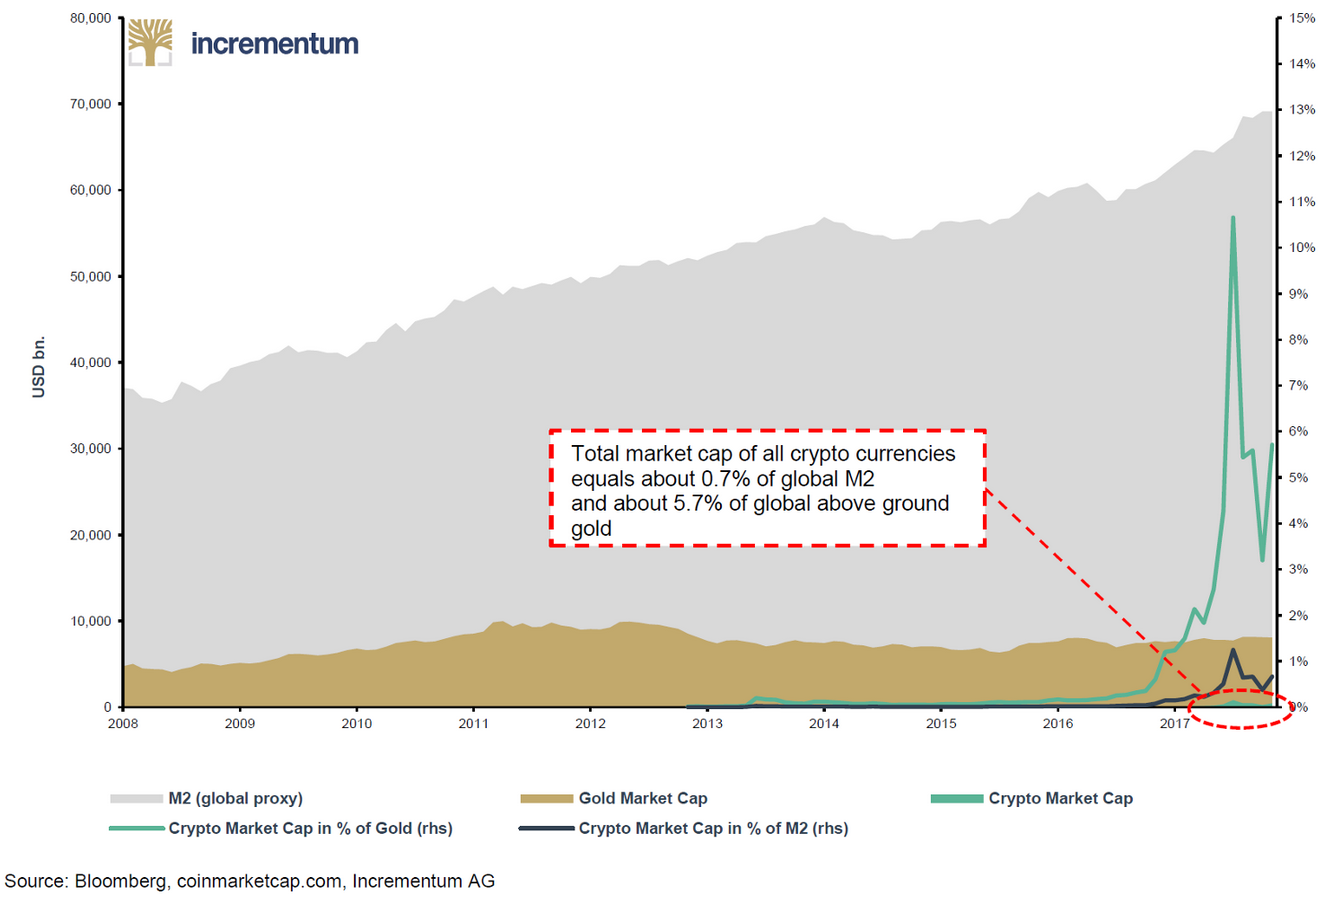 Market capitalization: cryptocurrencies vs. gold vs. M2